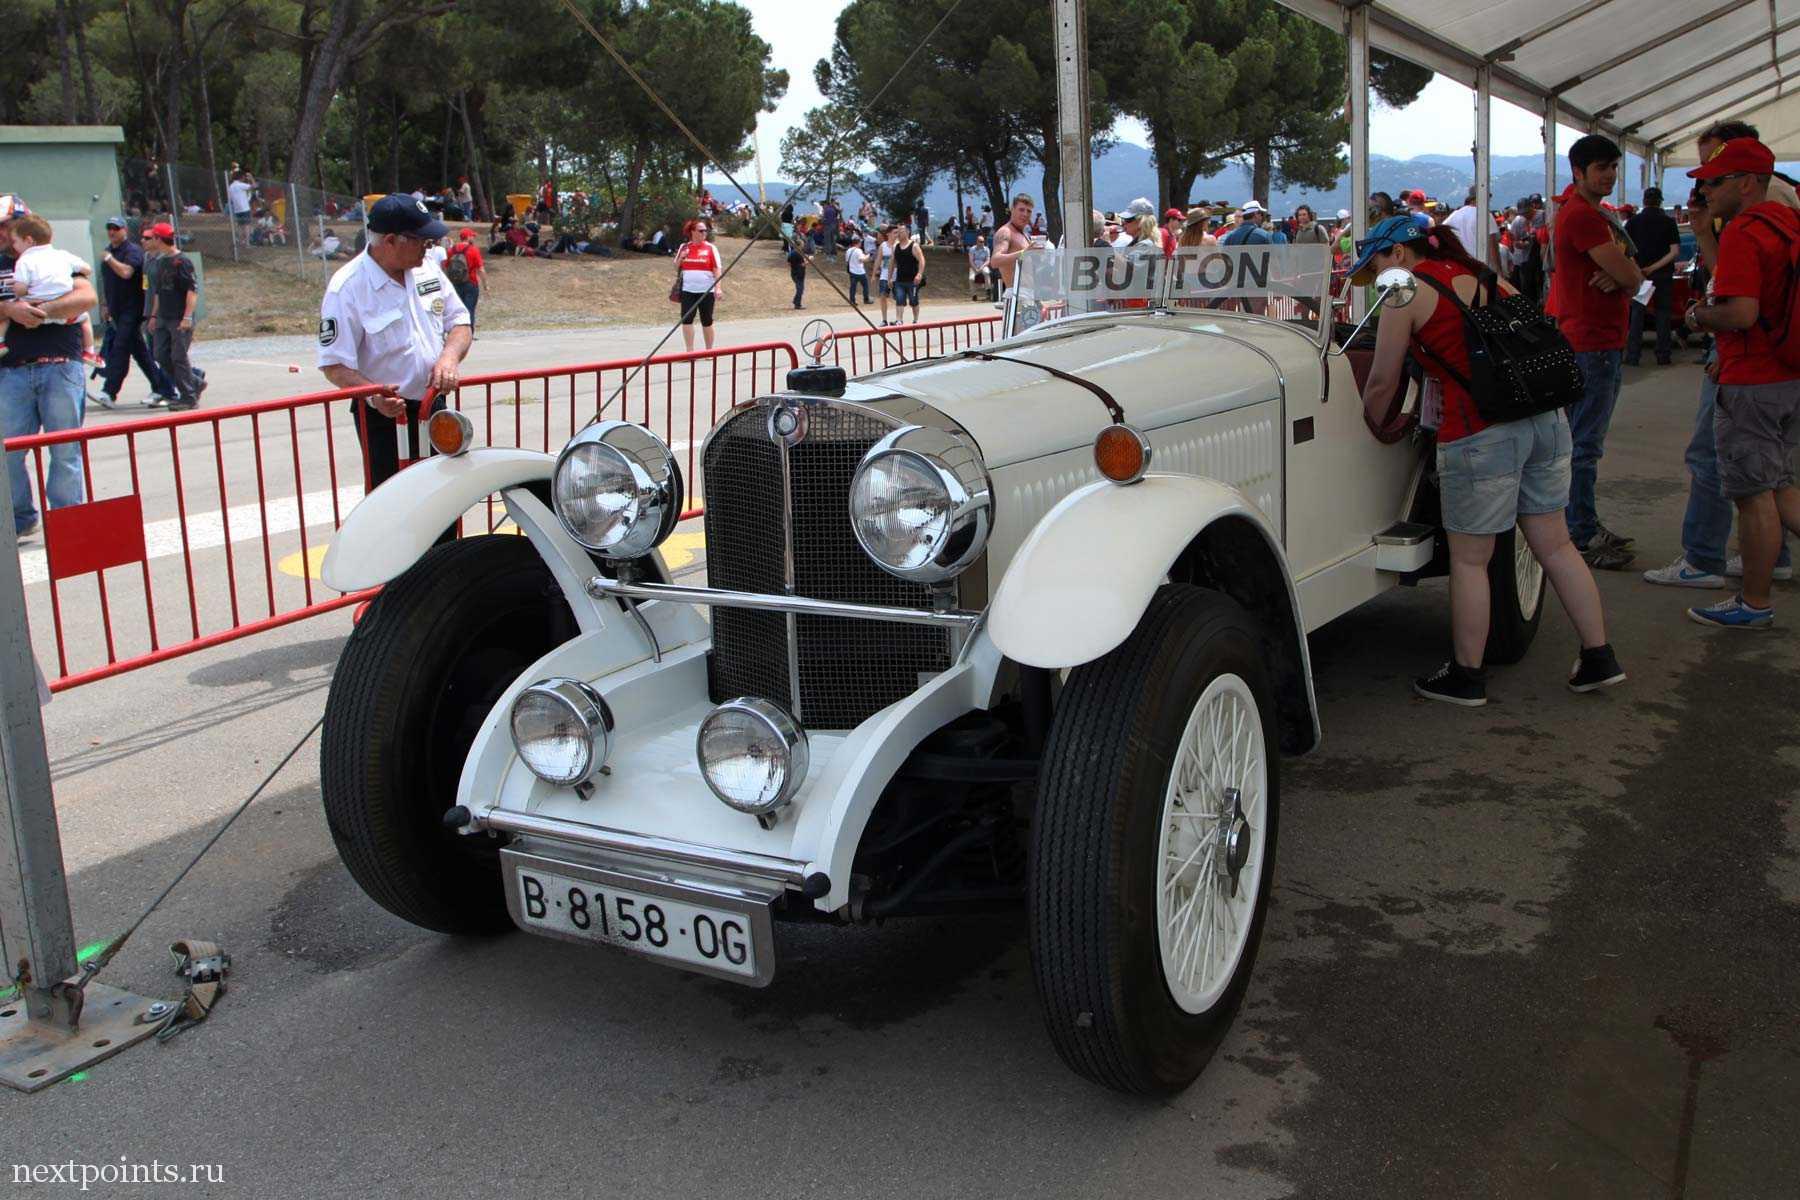 Машина Баттона с парада пилотов на трассе Формулы 1 в Испании